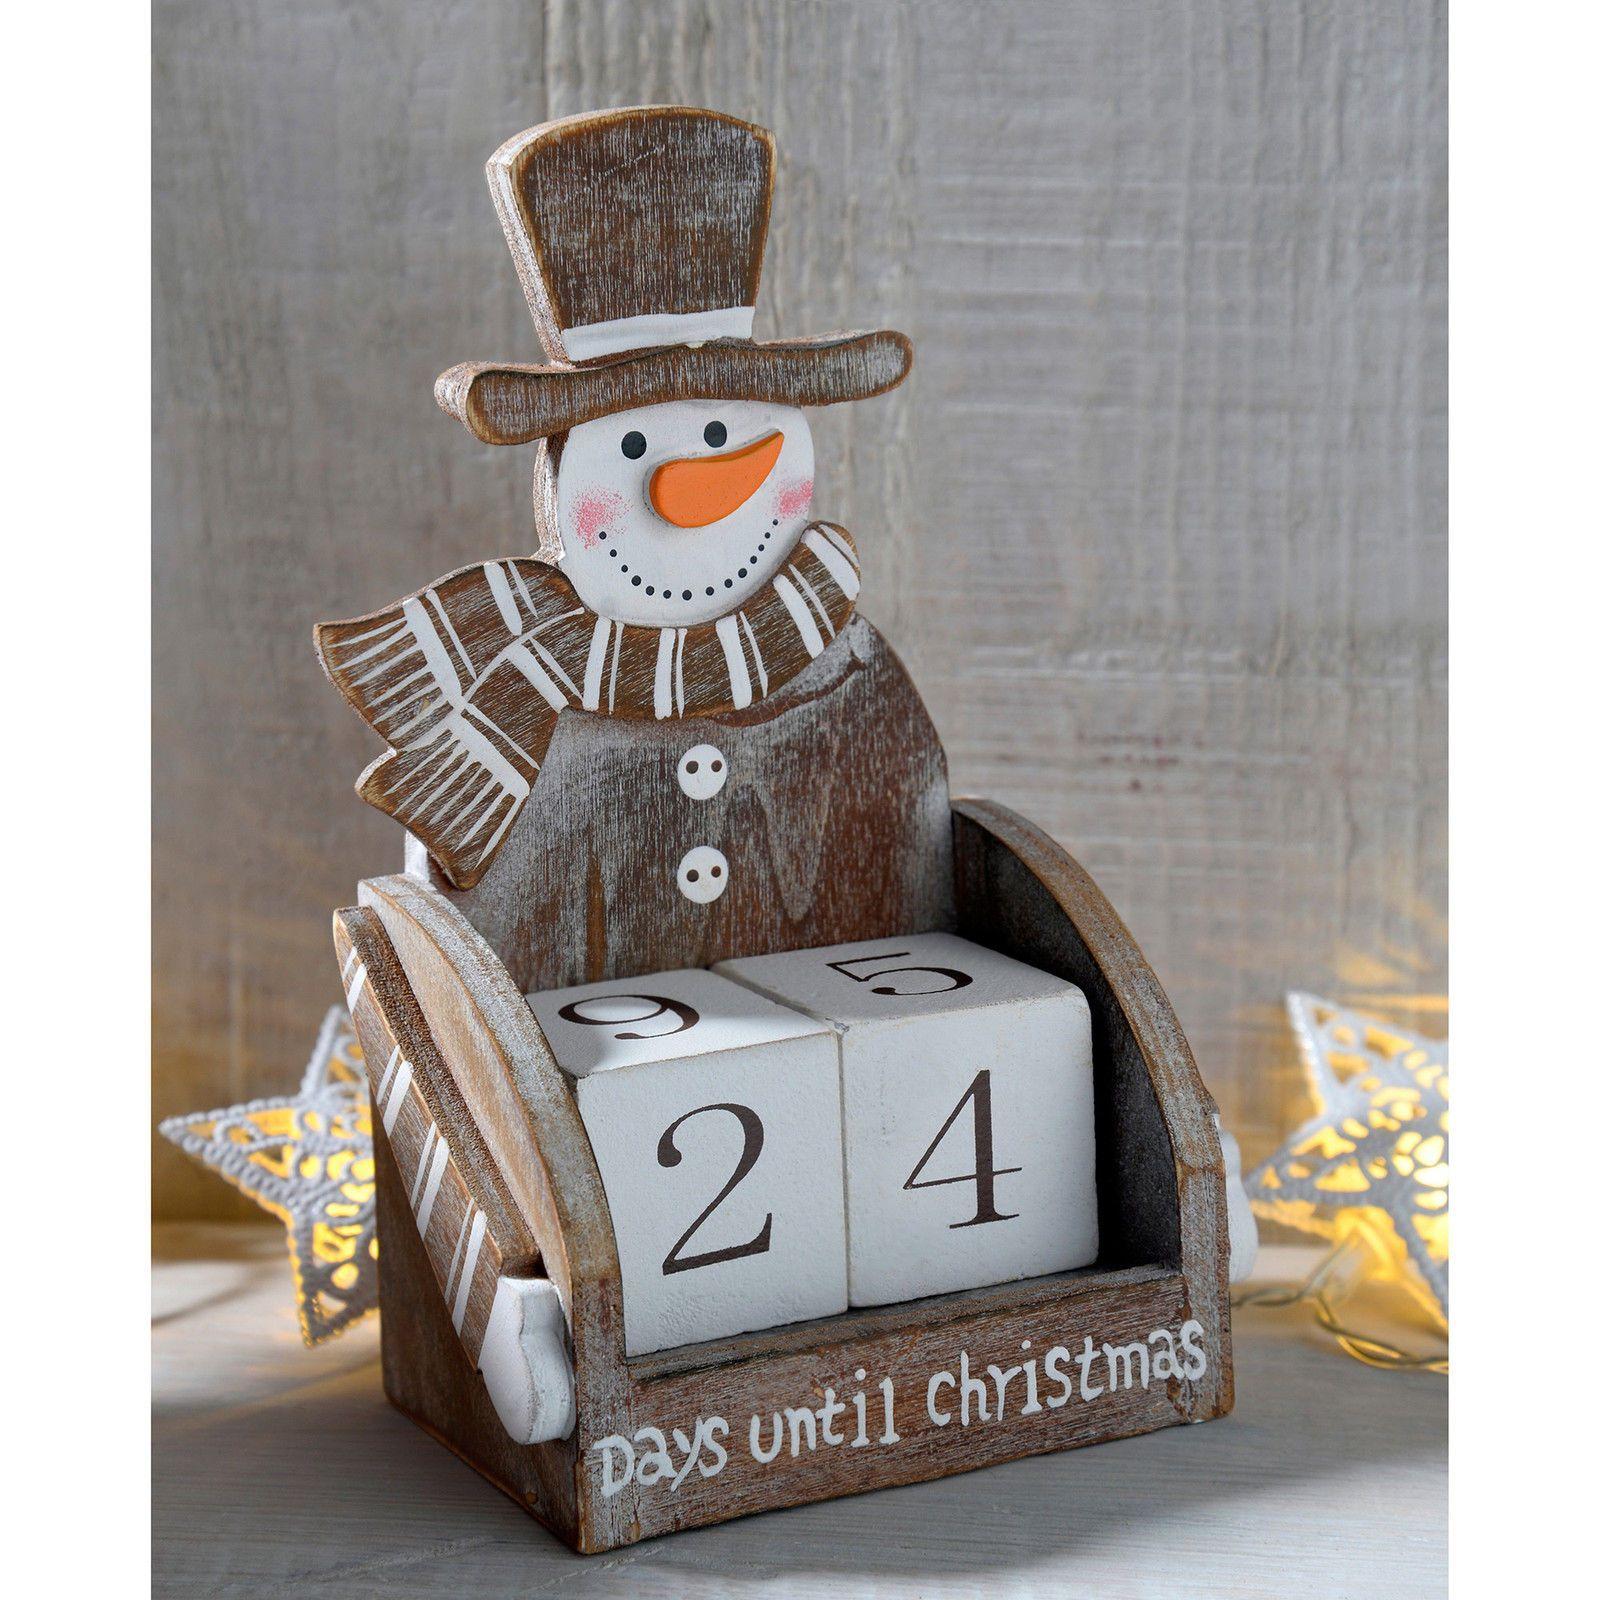 Wooden Advent Calendar Christmas Decoration, Santa Snowman Train Reindeer House